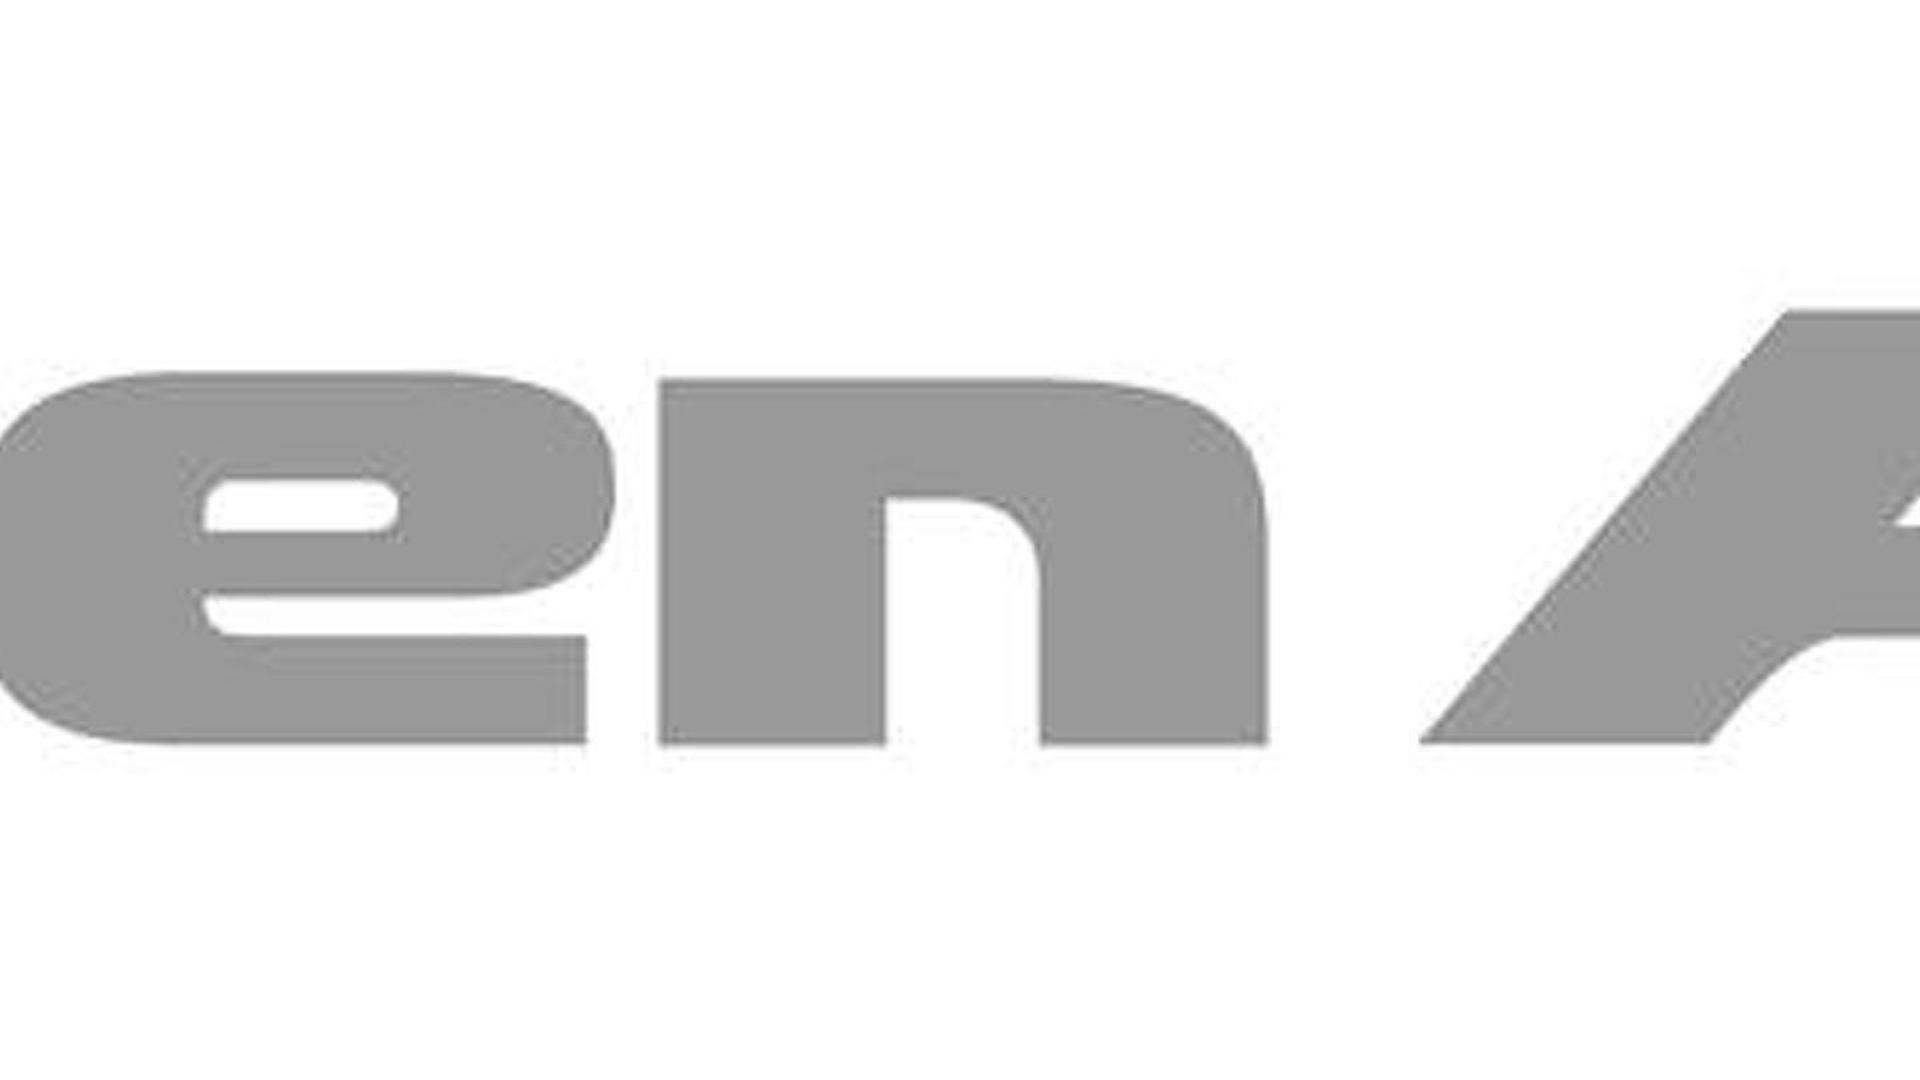 Mclaren P1 Gtr Logo >> Mclaren P1 Gtr Logo 2019 2020 Car Release Date